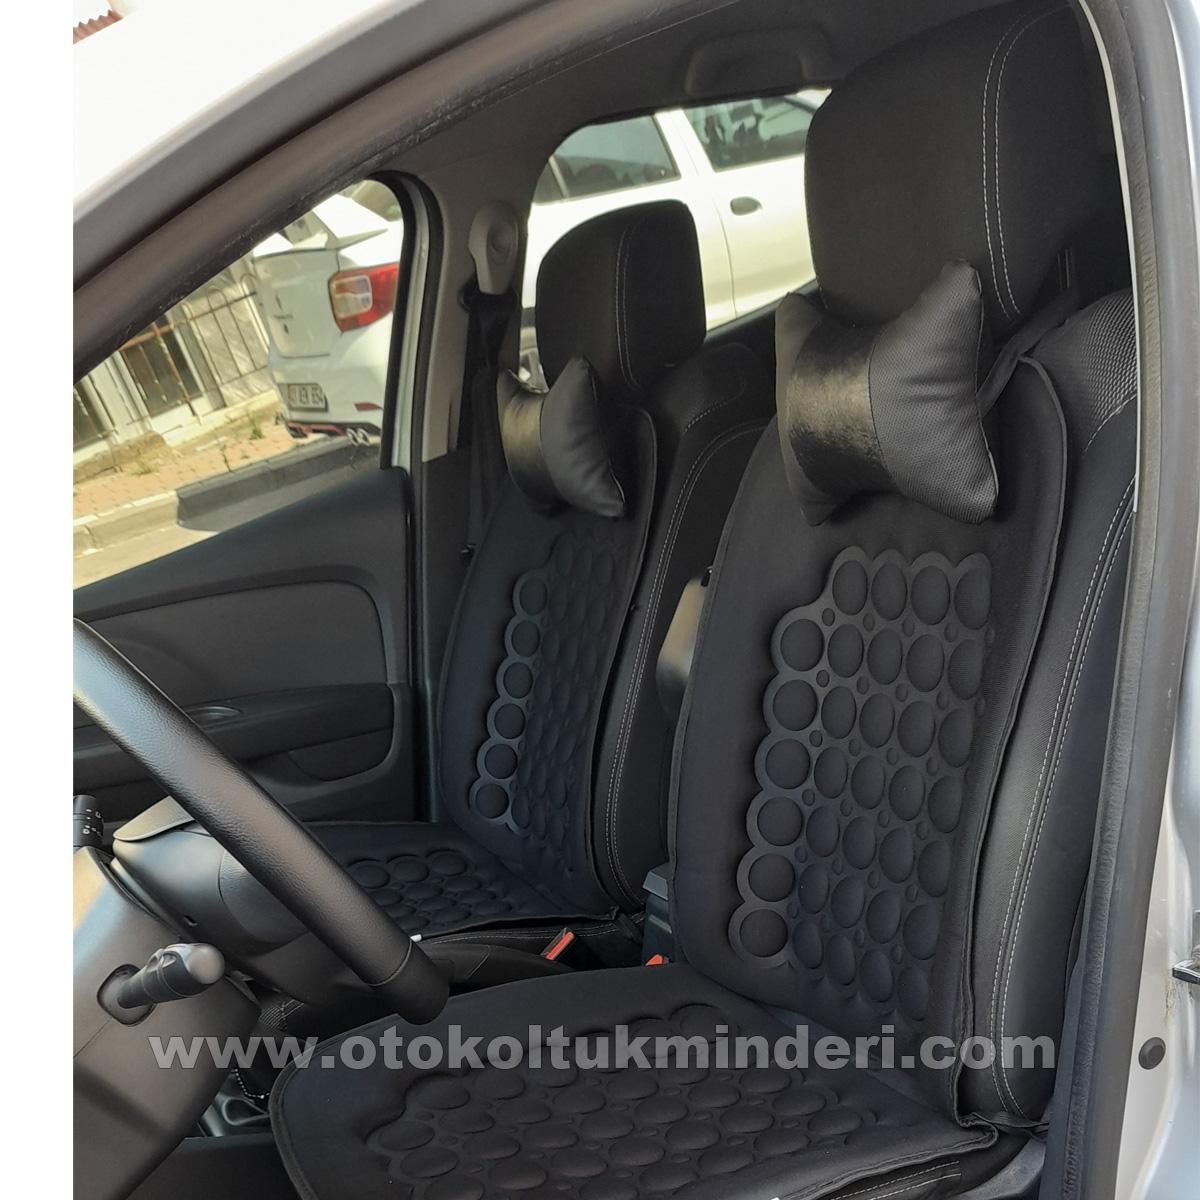 Chevrolet koltuk minderi - Chevrolet uyumlu koltuk minderi